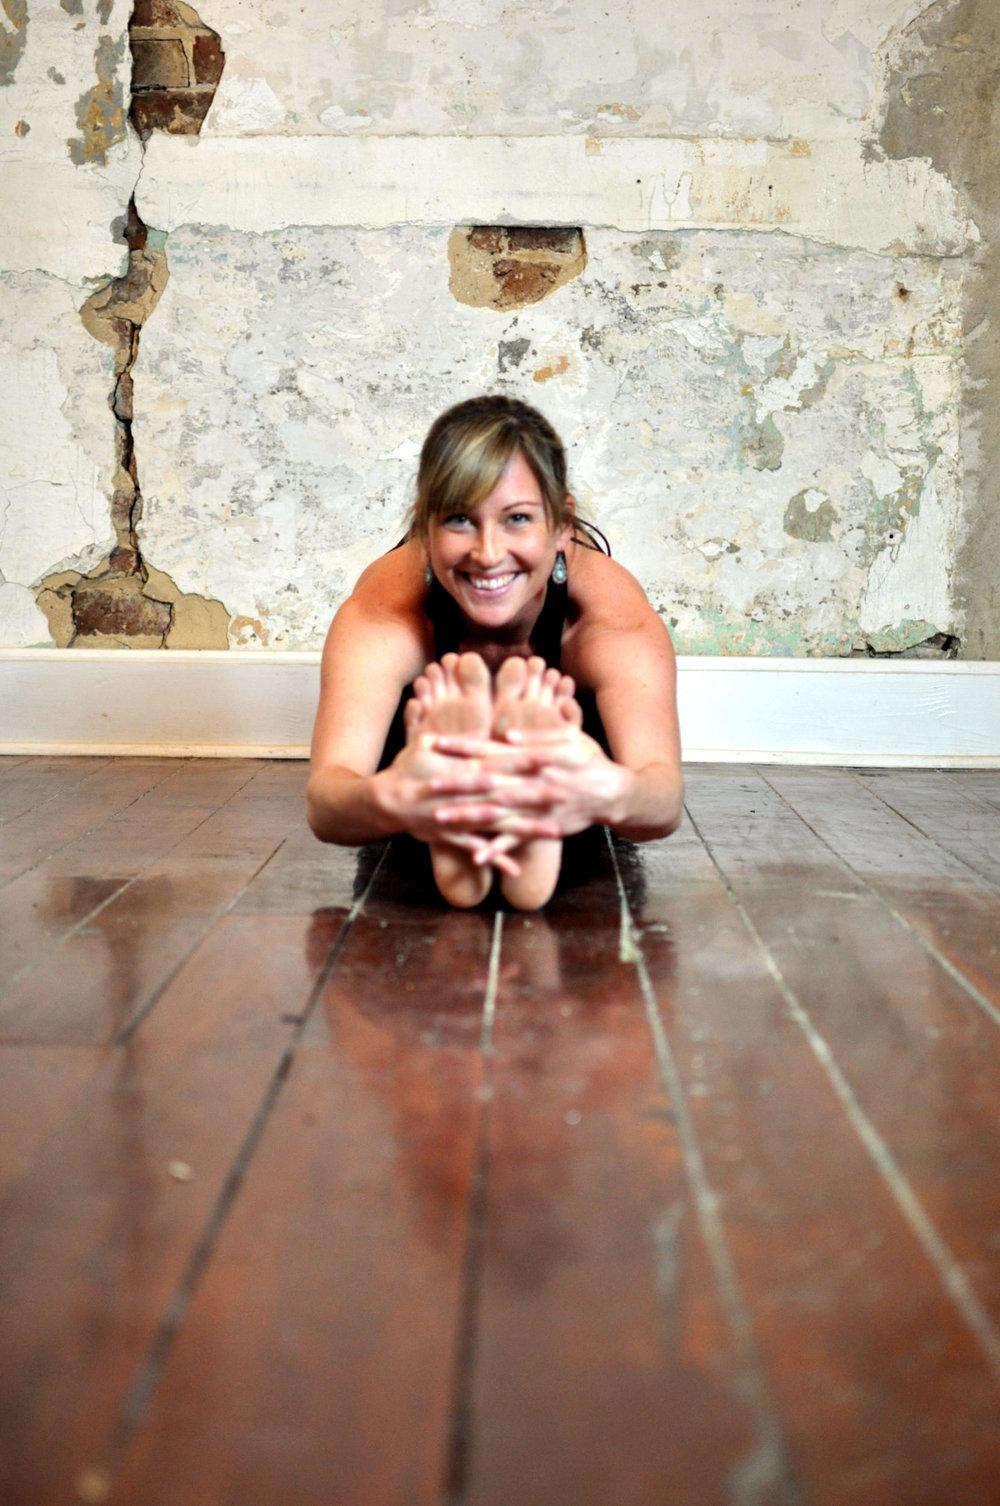 200HR RYT  18 Hour Children's Yoga Certification  Assistant training.